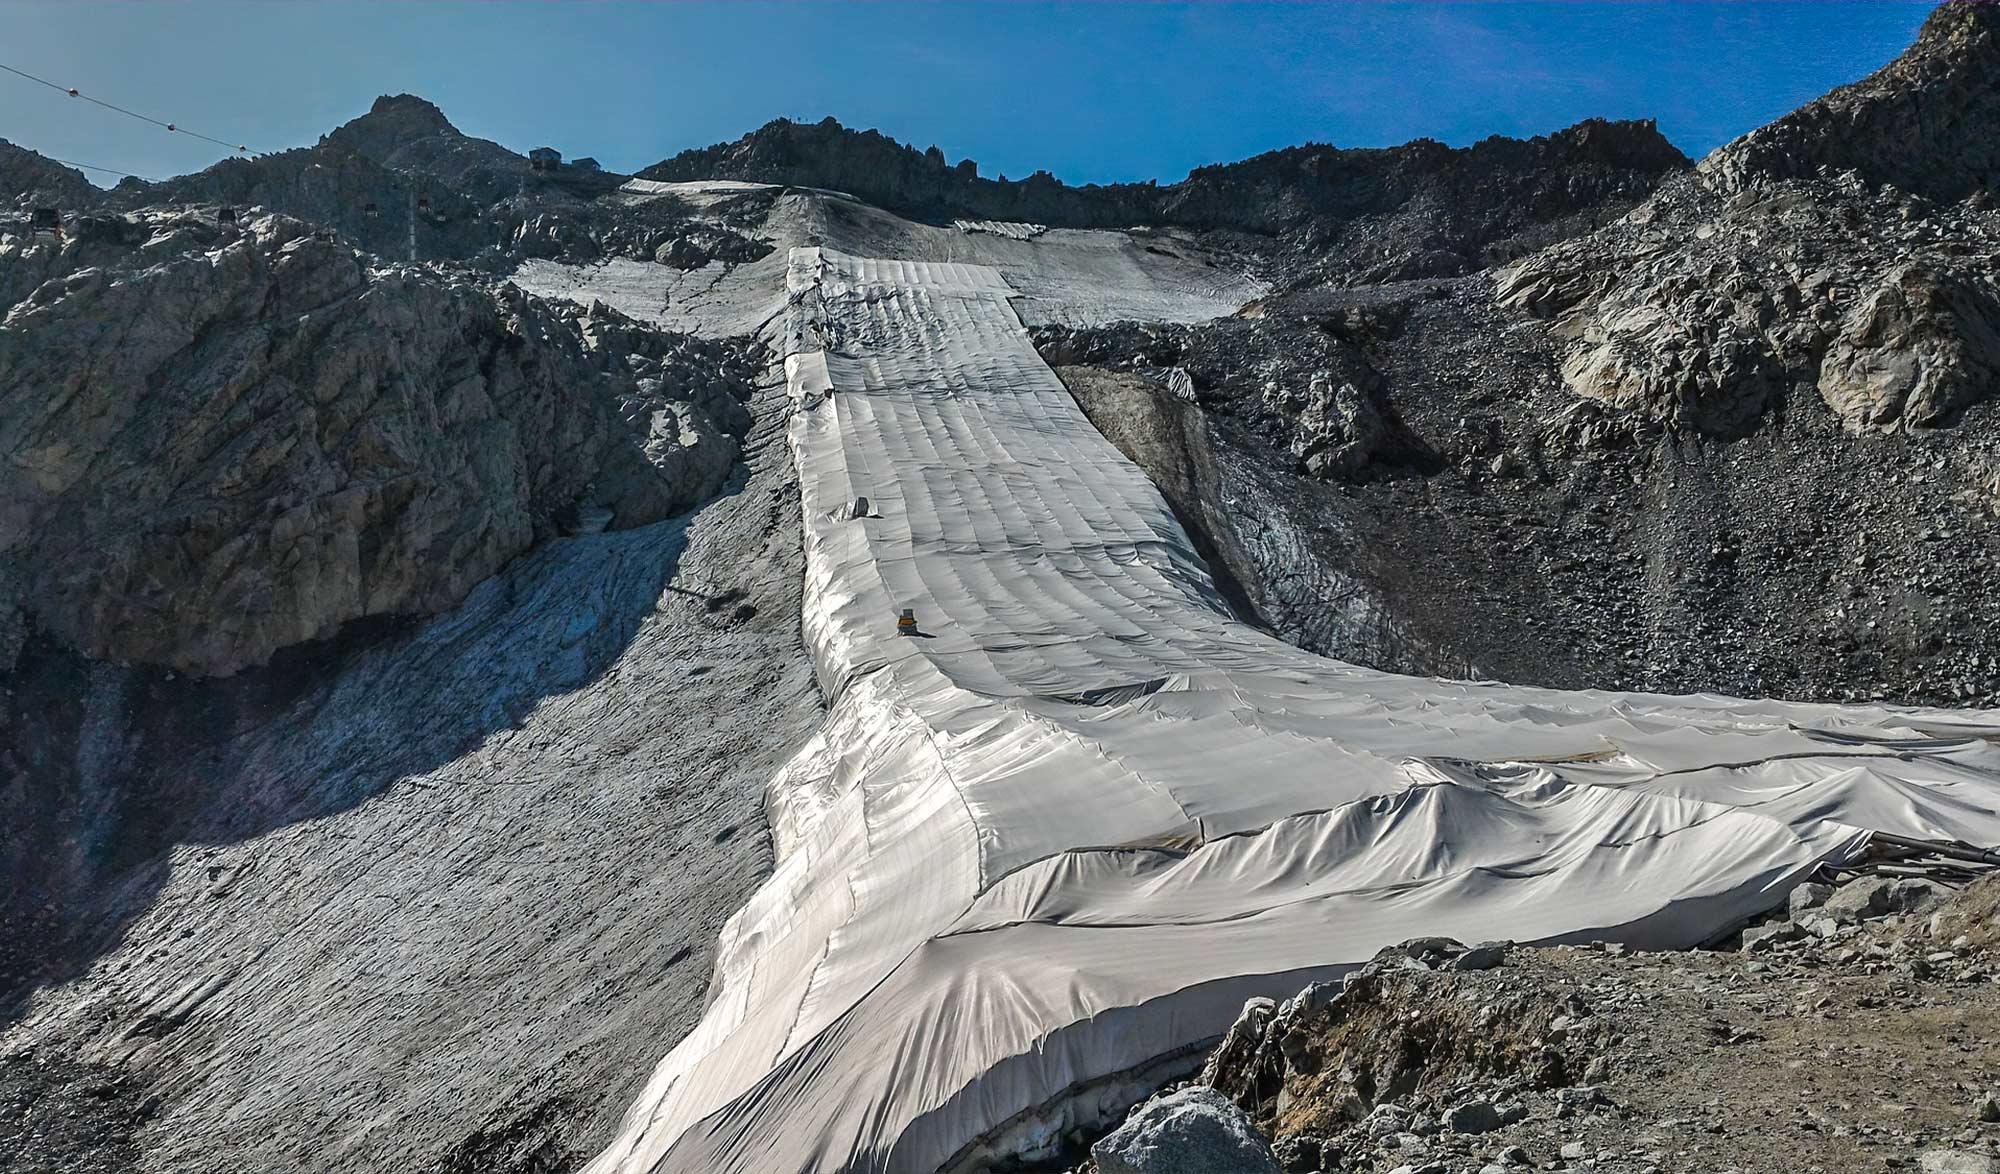 Glacier de Presena recouvert de draps blanc